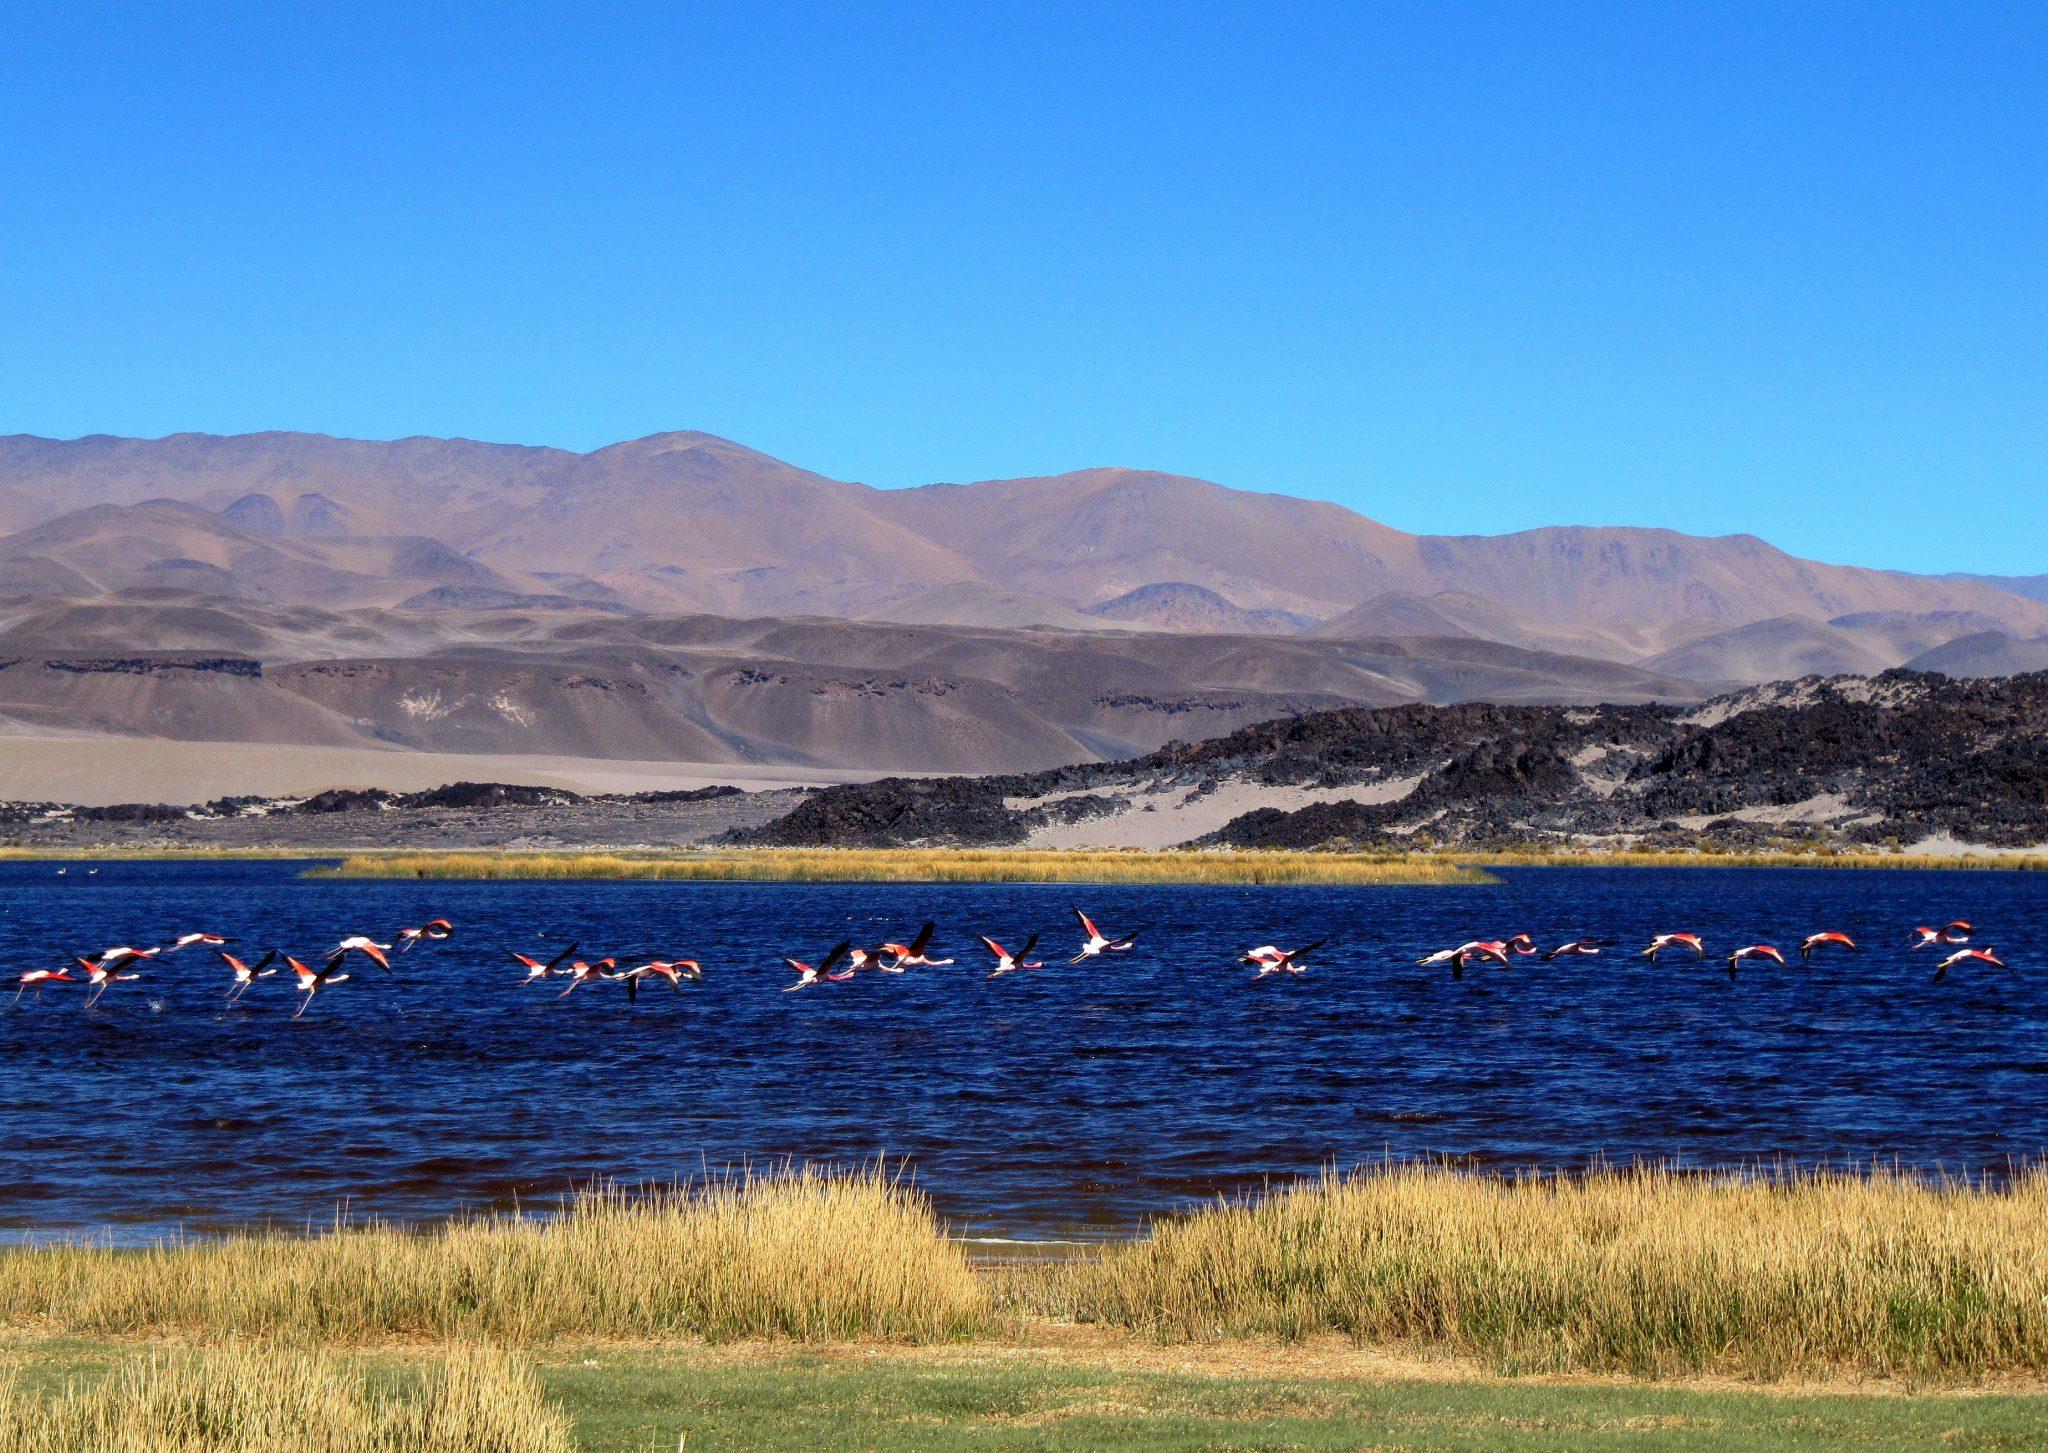 Thumbnail Voorbeeldreizen Argentinië Puna - Argentinië